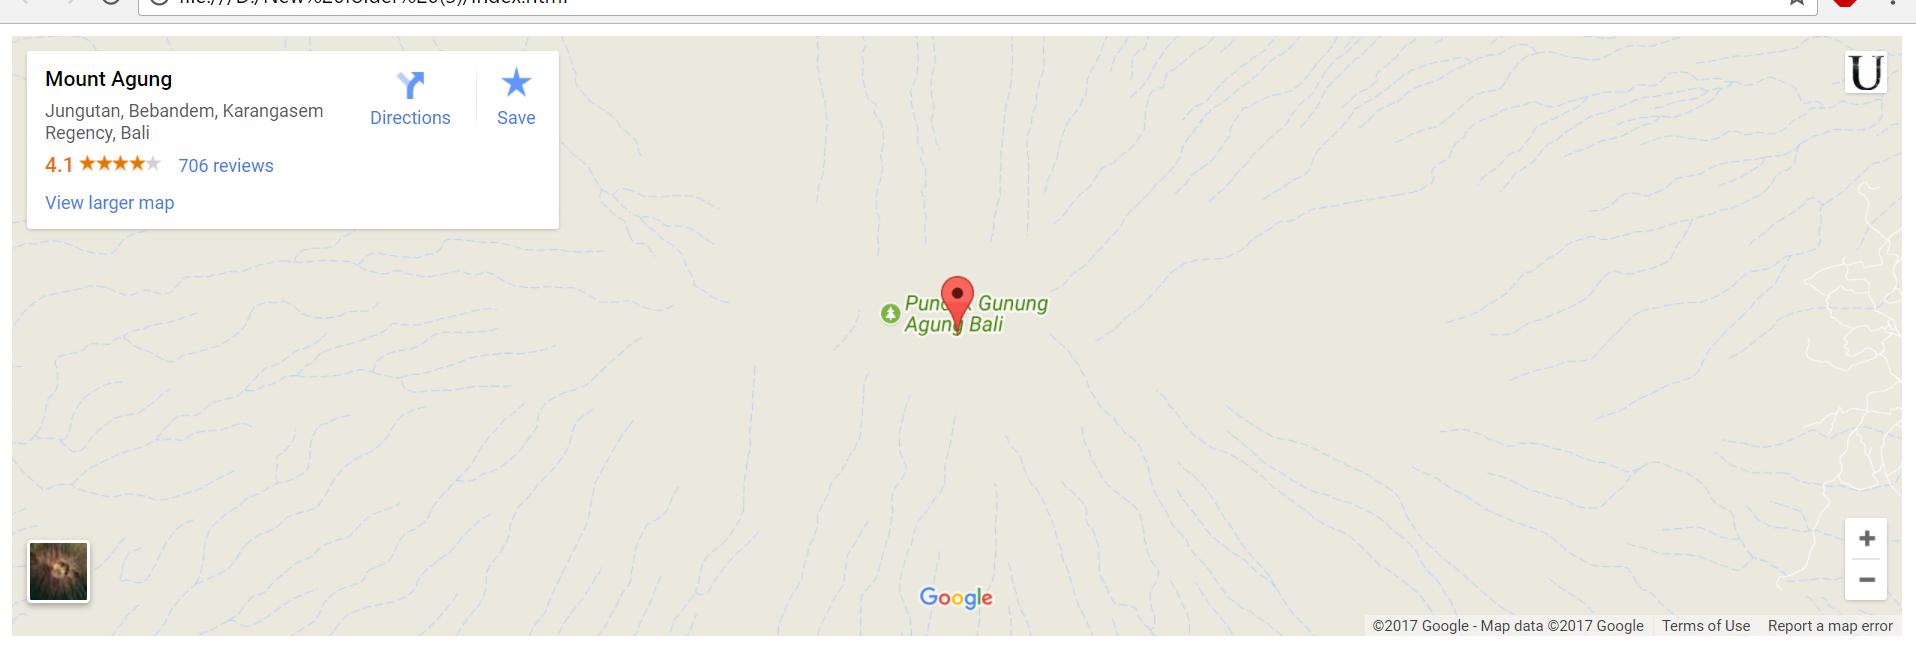 Pengenalan Code HTML Google Maps